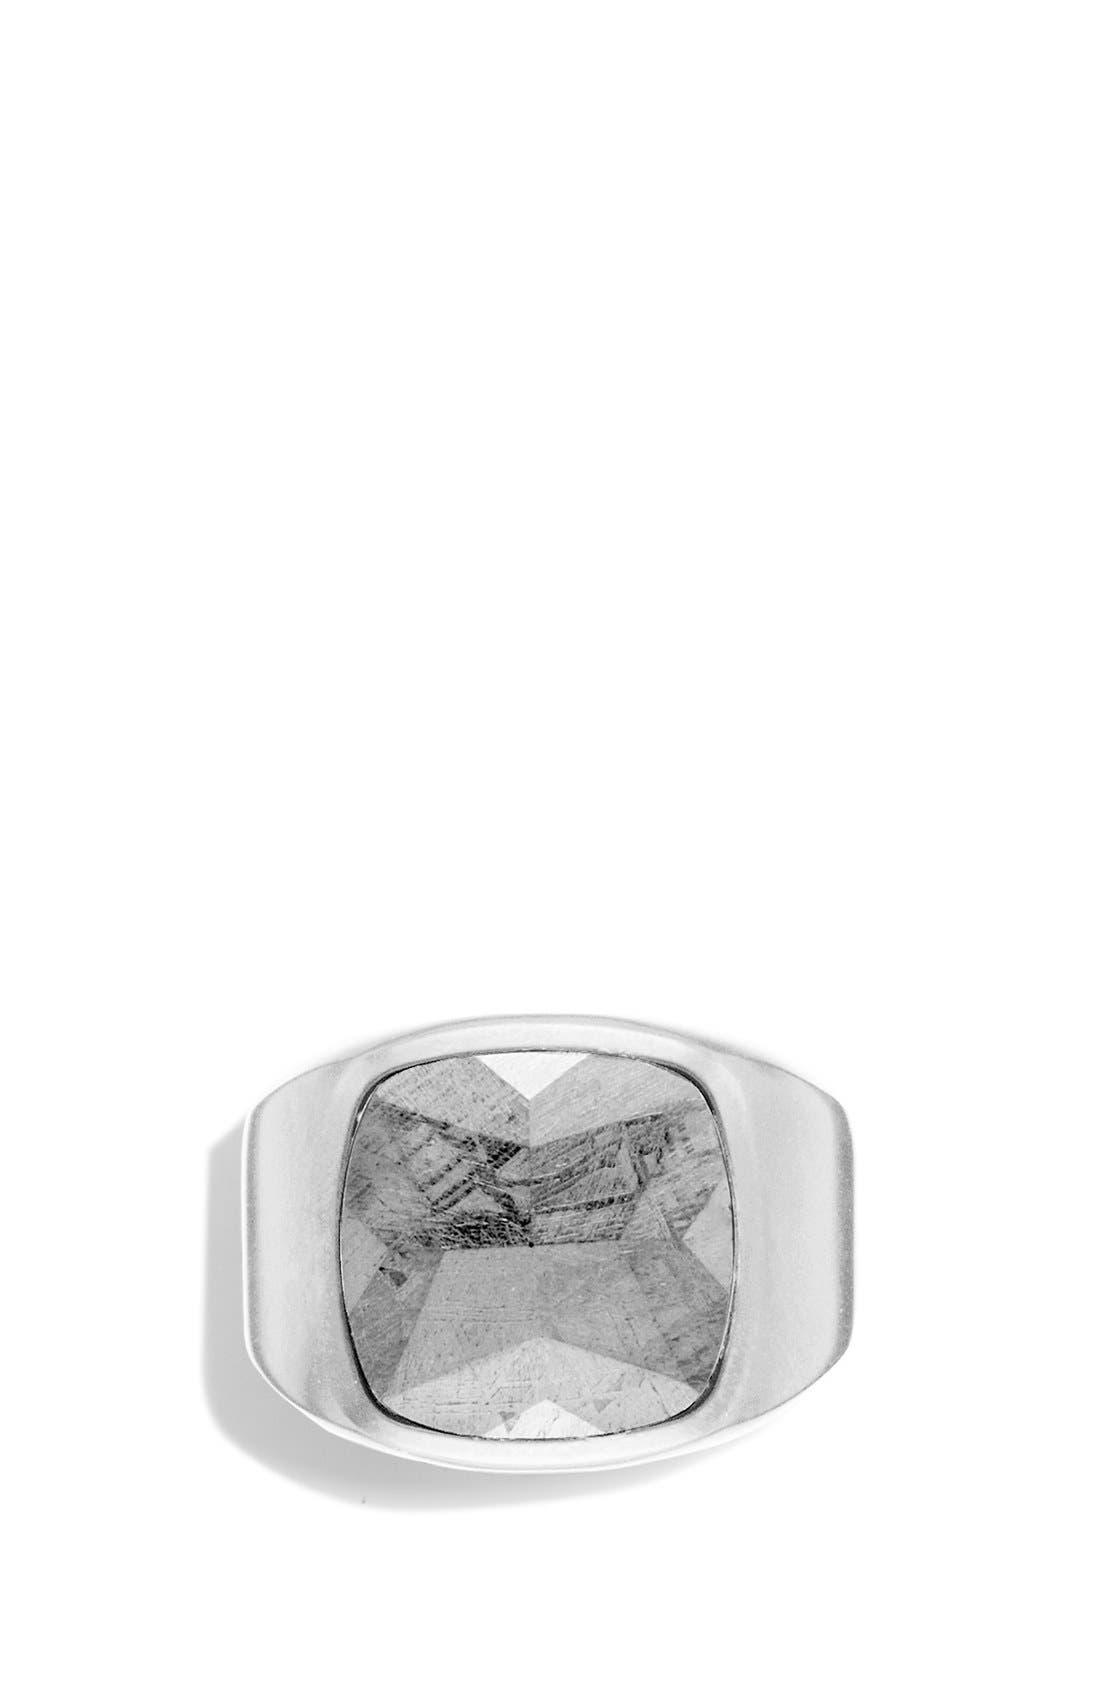 Signet Ring with Meteorite,                             Alternate thumbnail 3, color,                             Meteorite